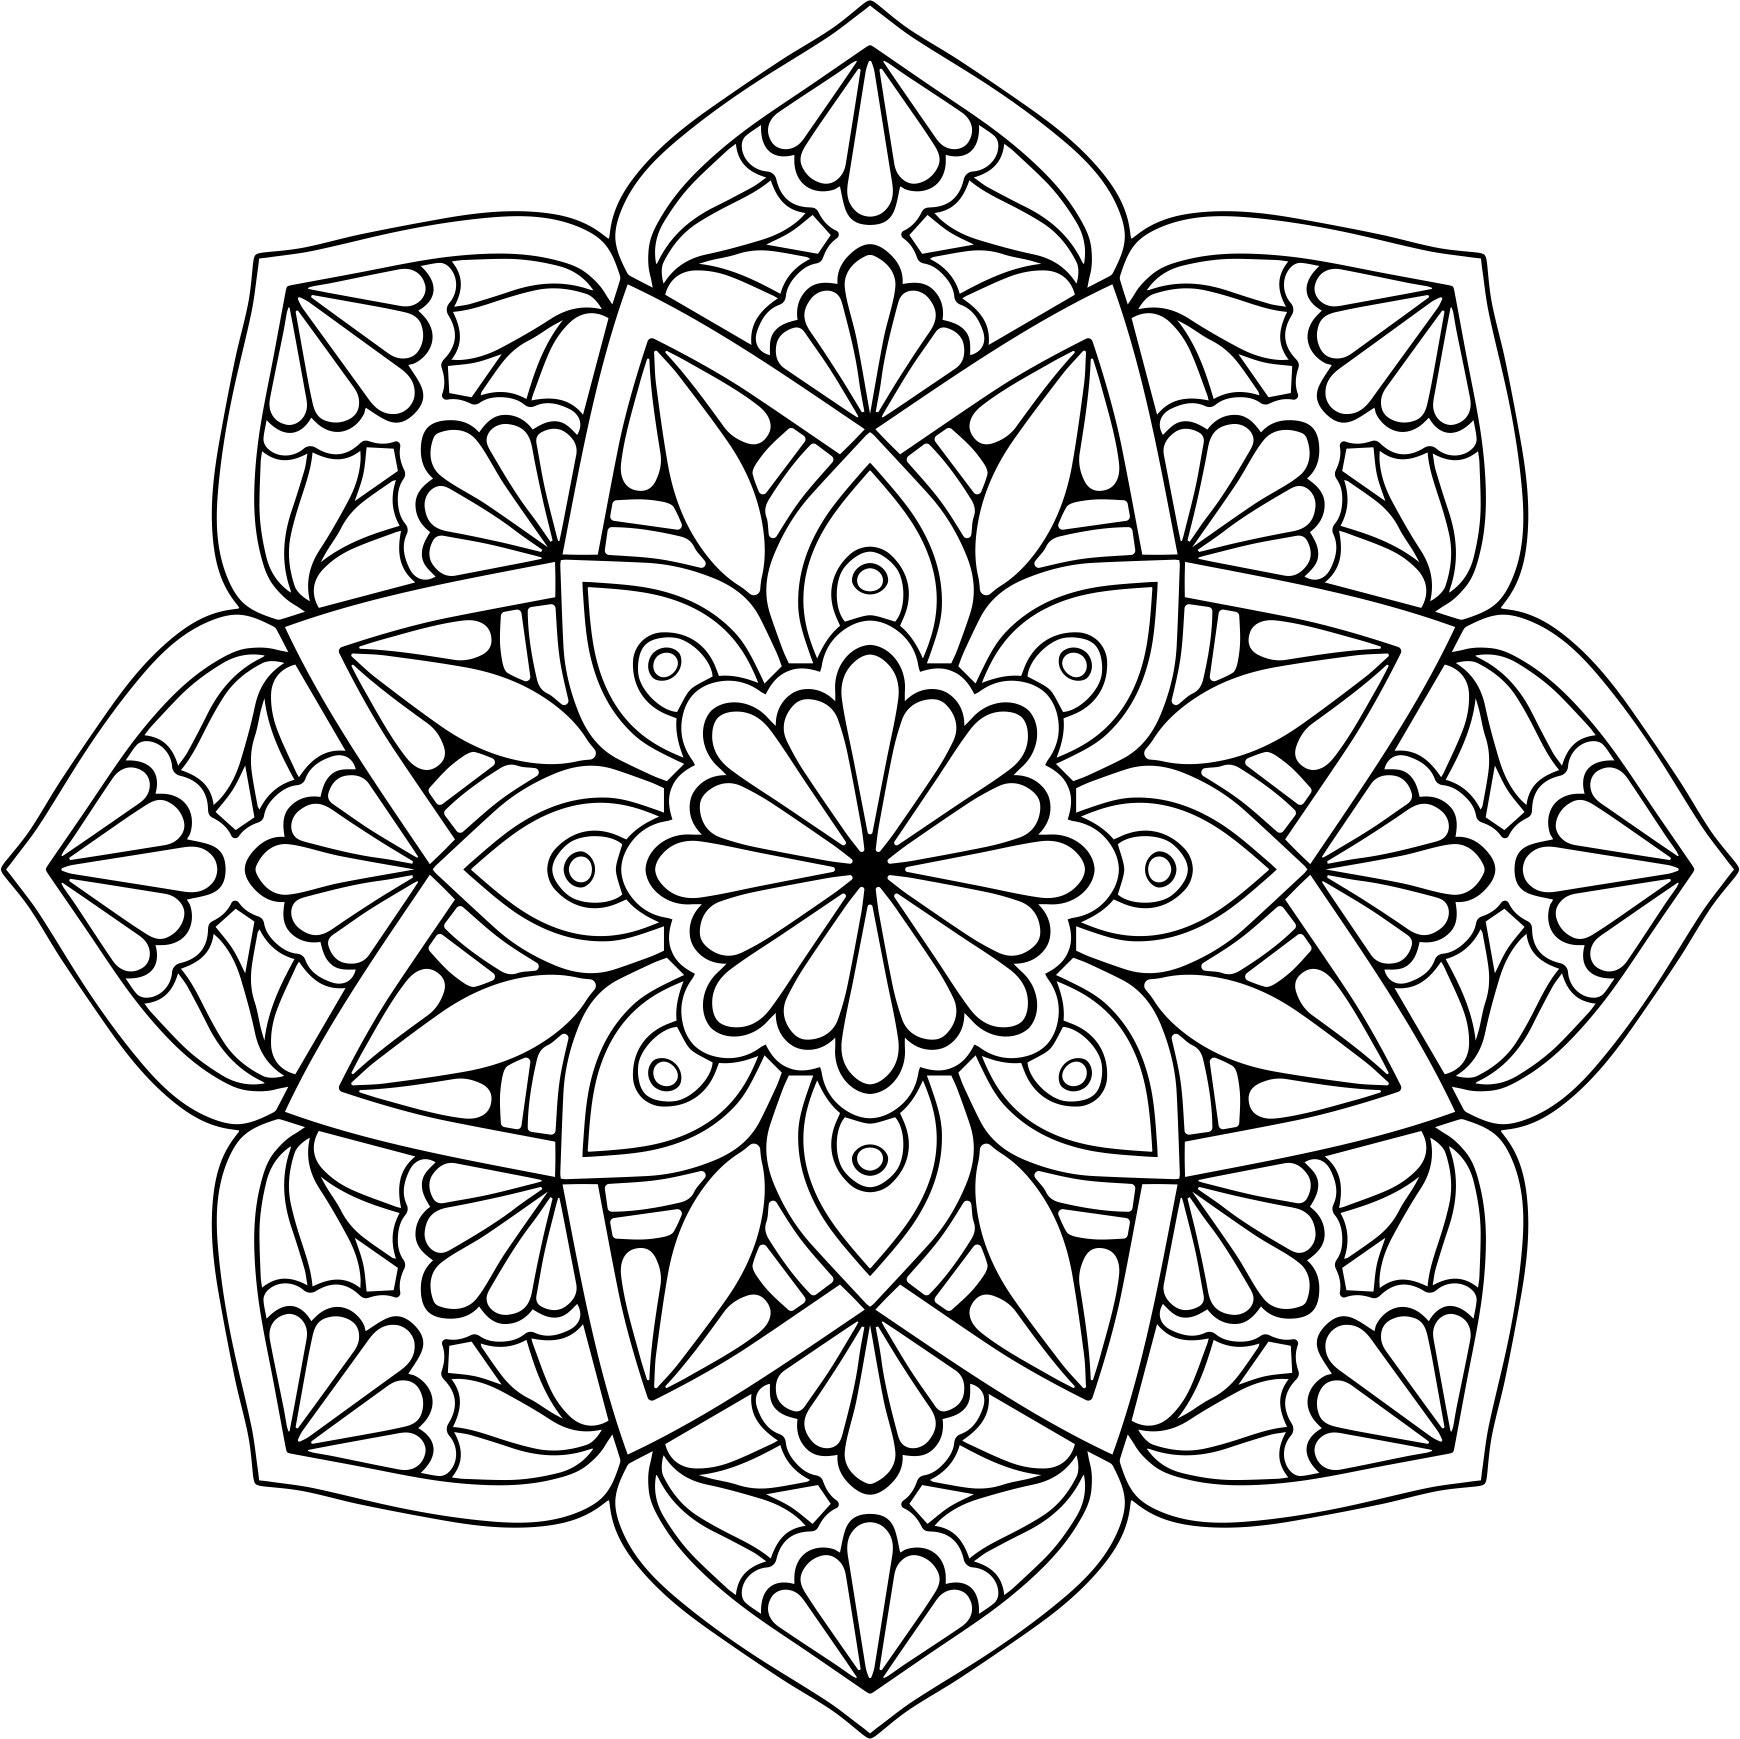 Mandala Floral Vector (.eps) Free Vector Download - 3axis.co